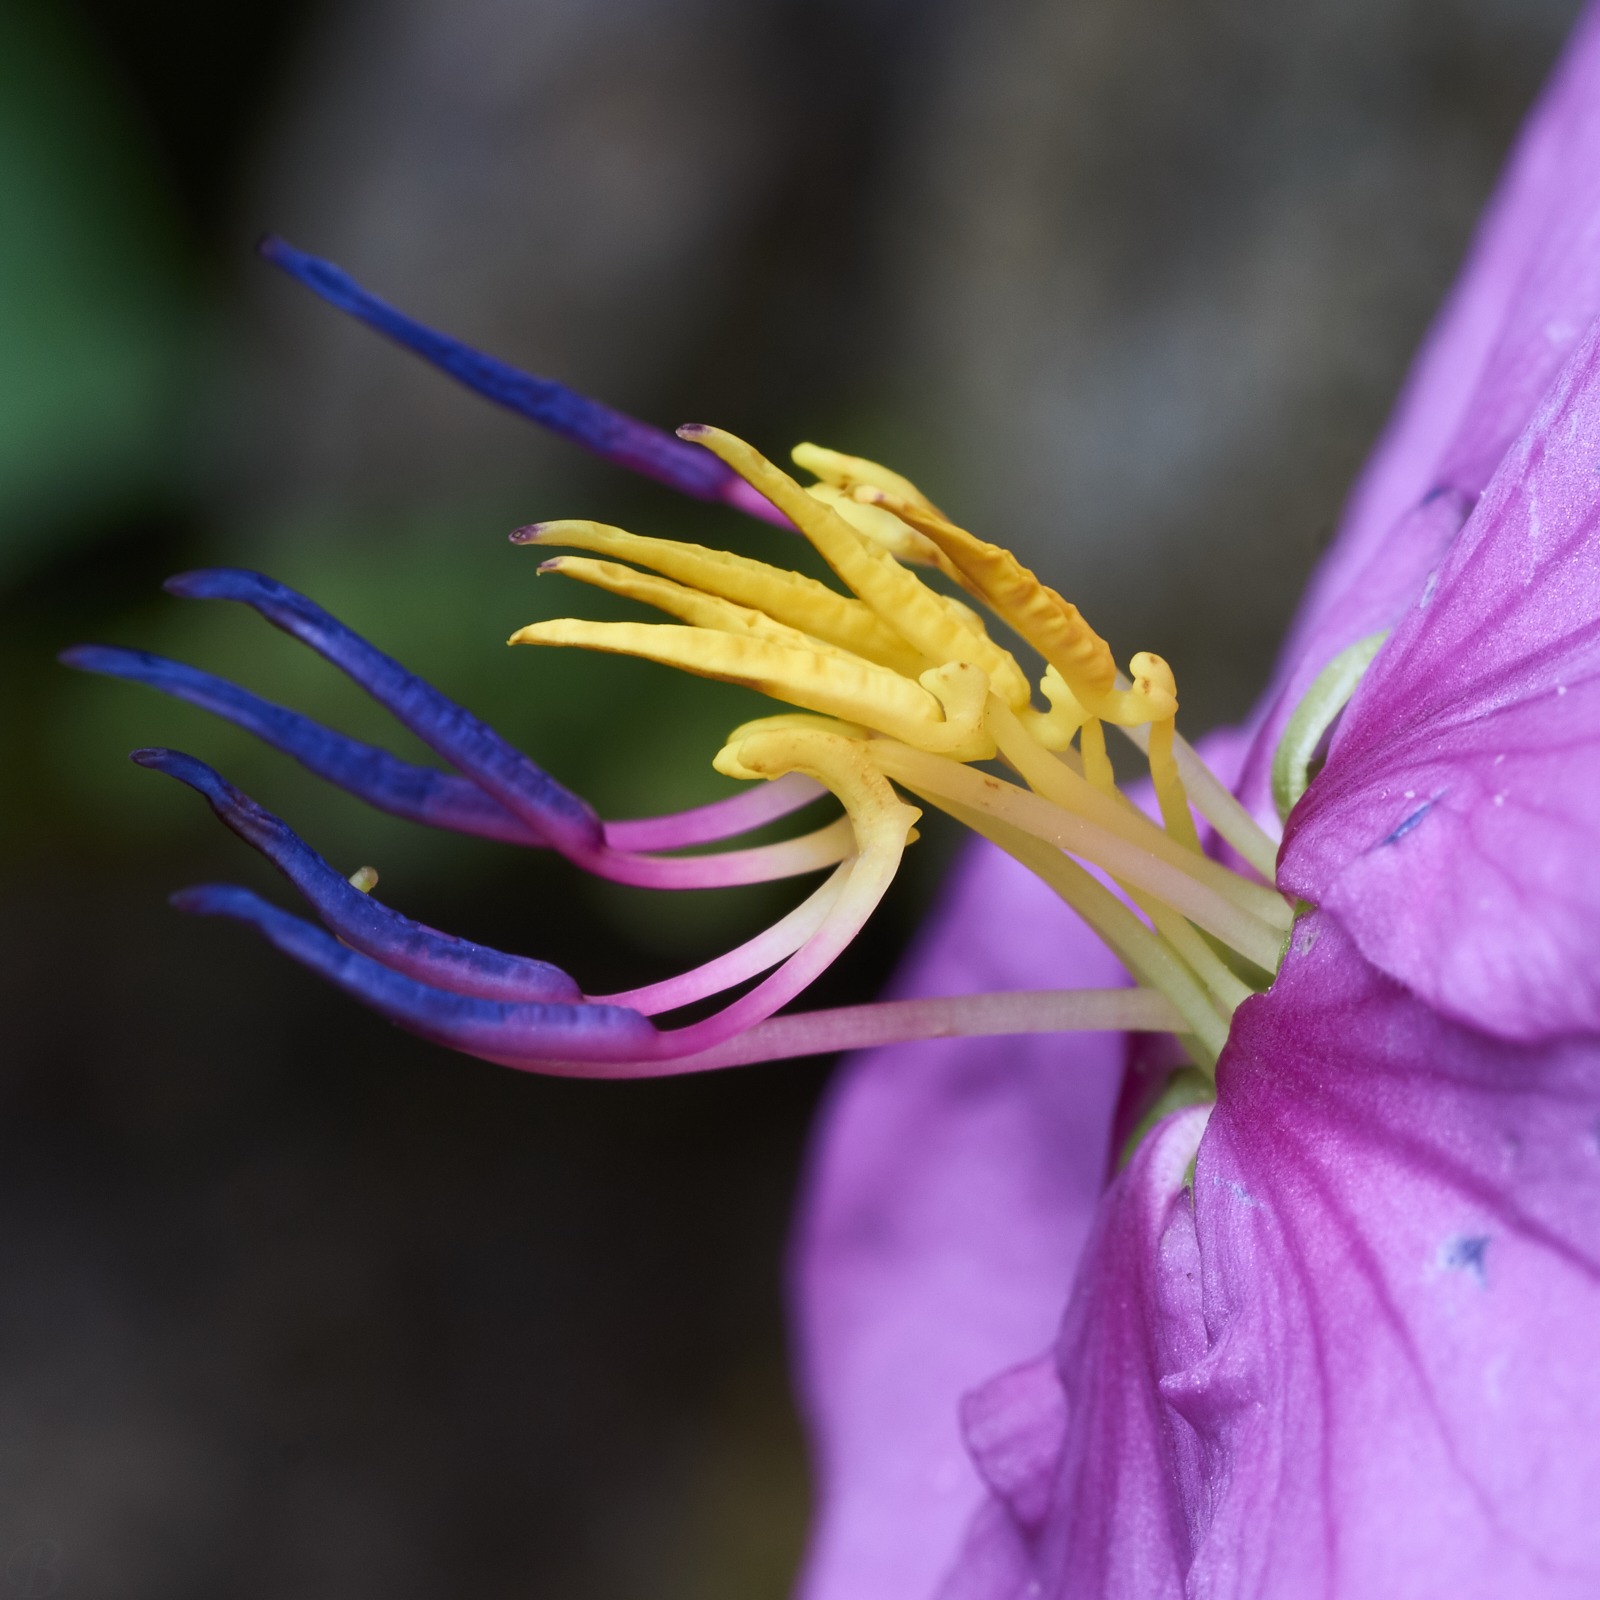 flower, purple,yellow,mauve,green,grey,Philippines,macro photography